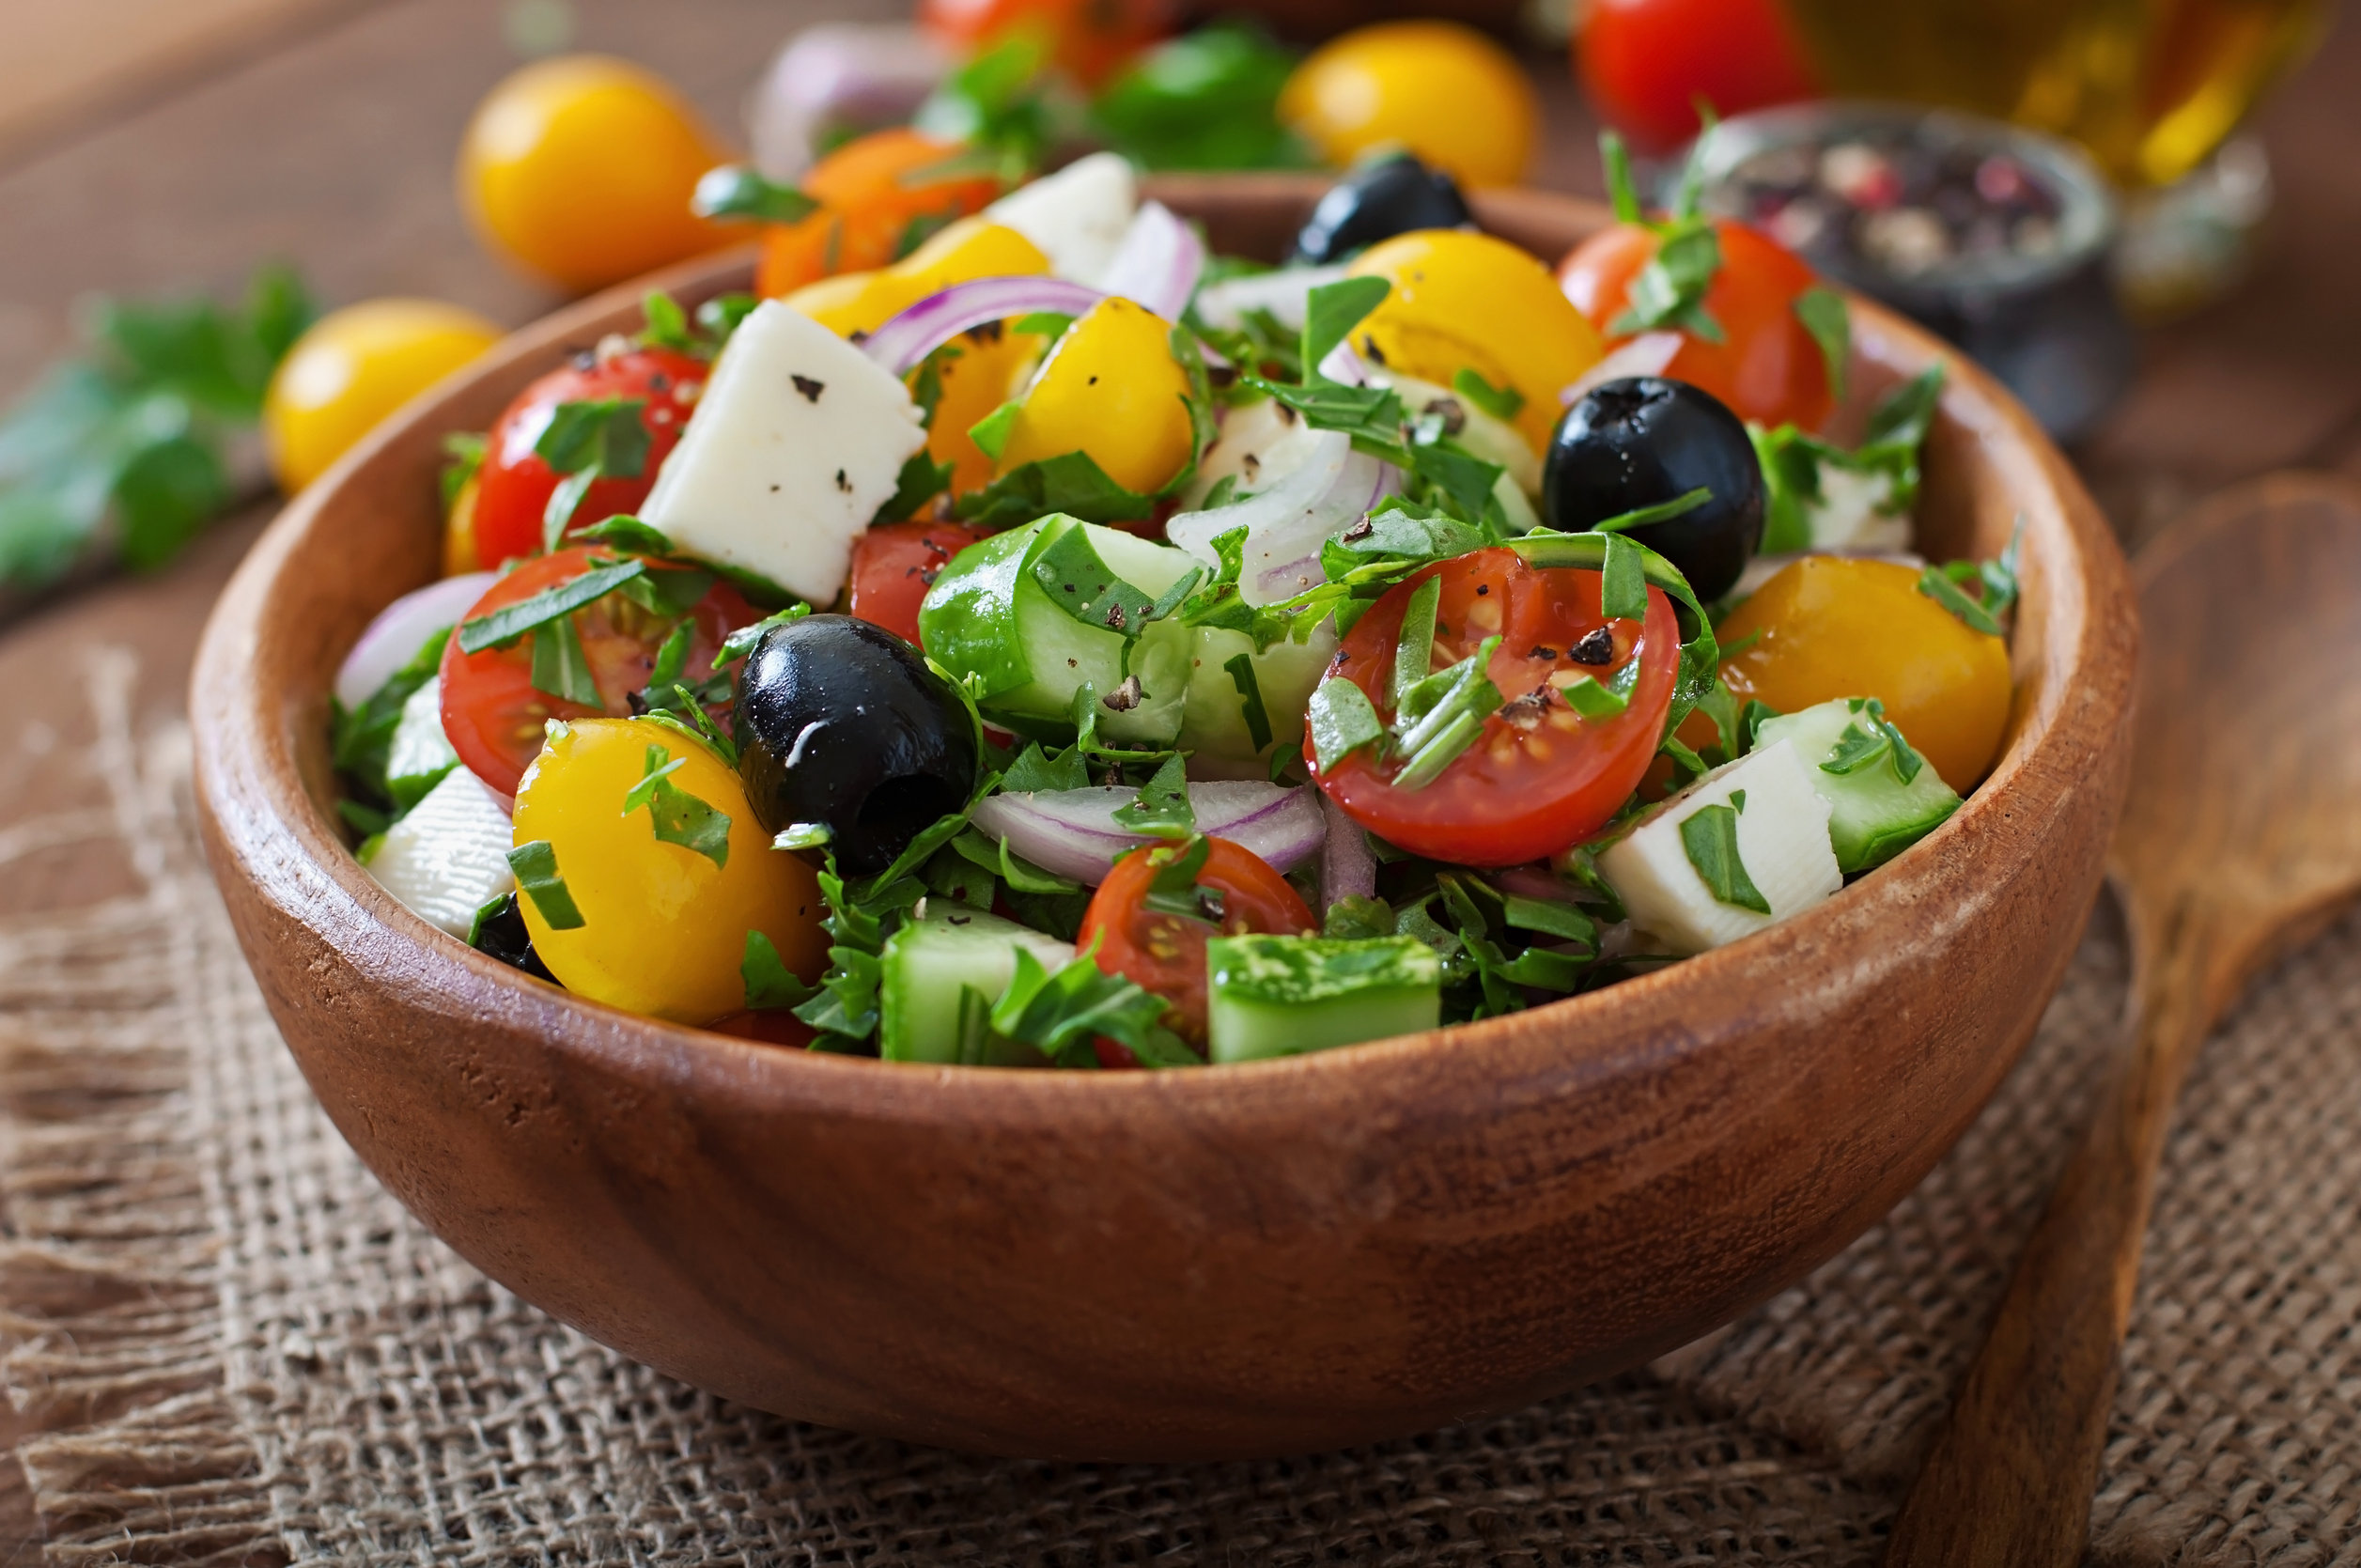 Cucumber Tomato Salad with Maple Vinaigrette